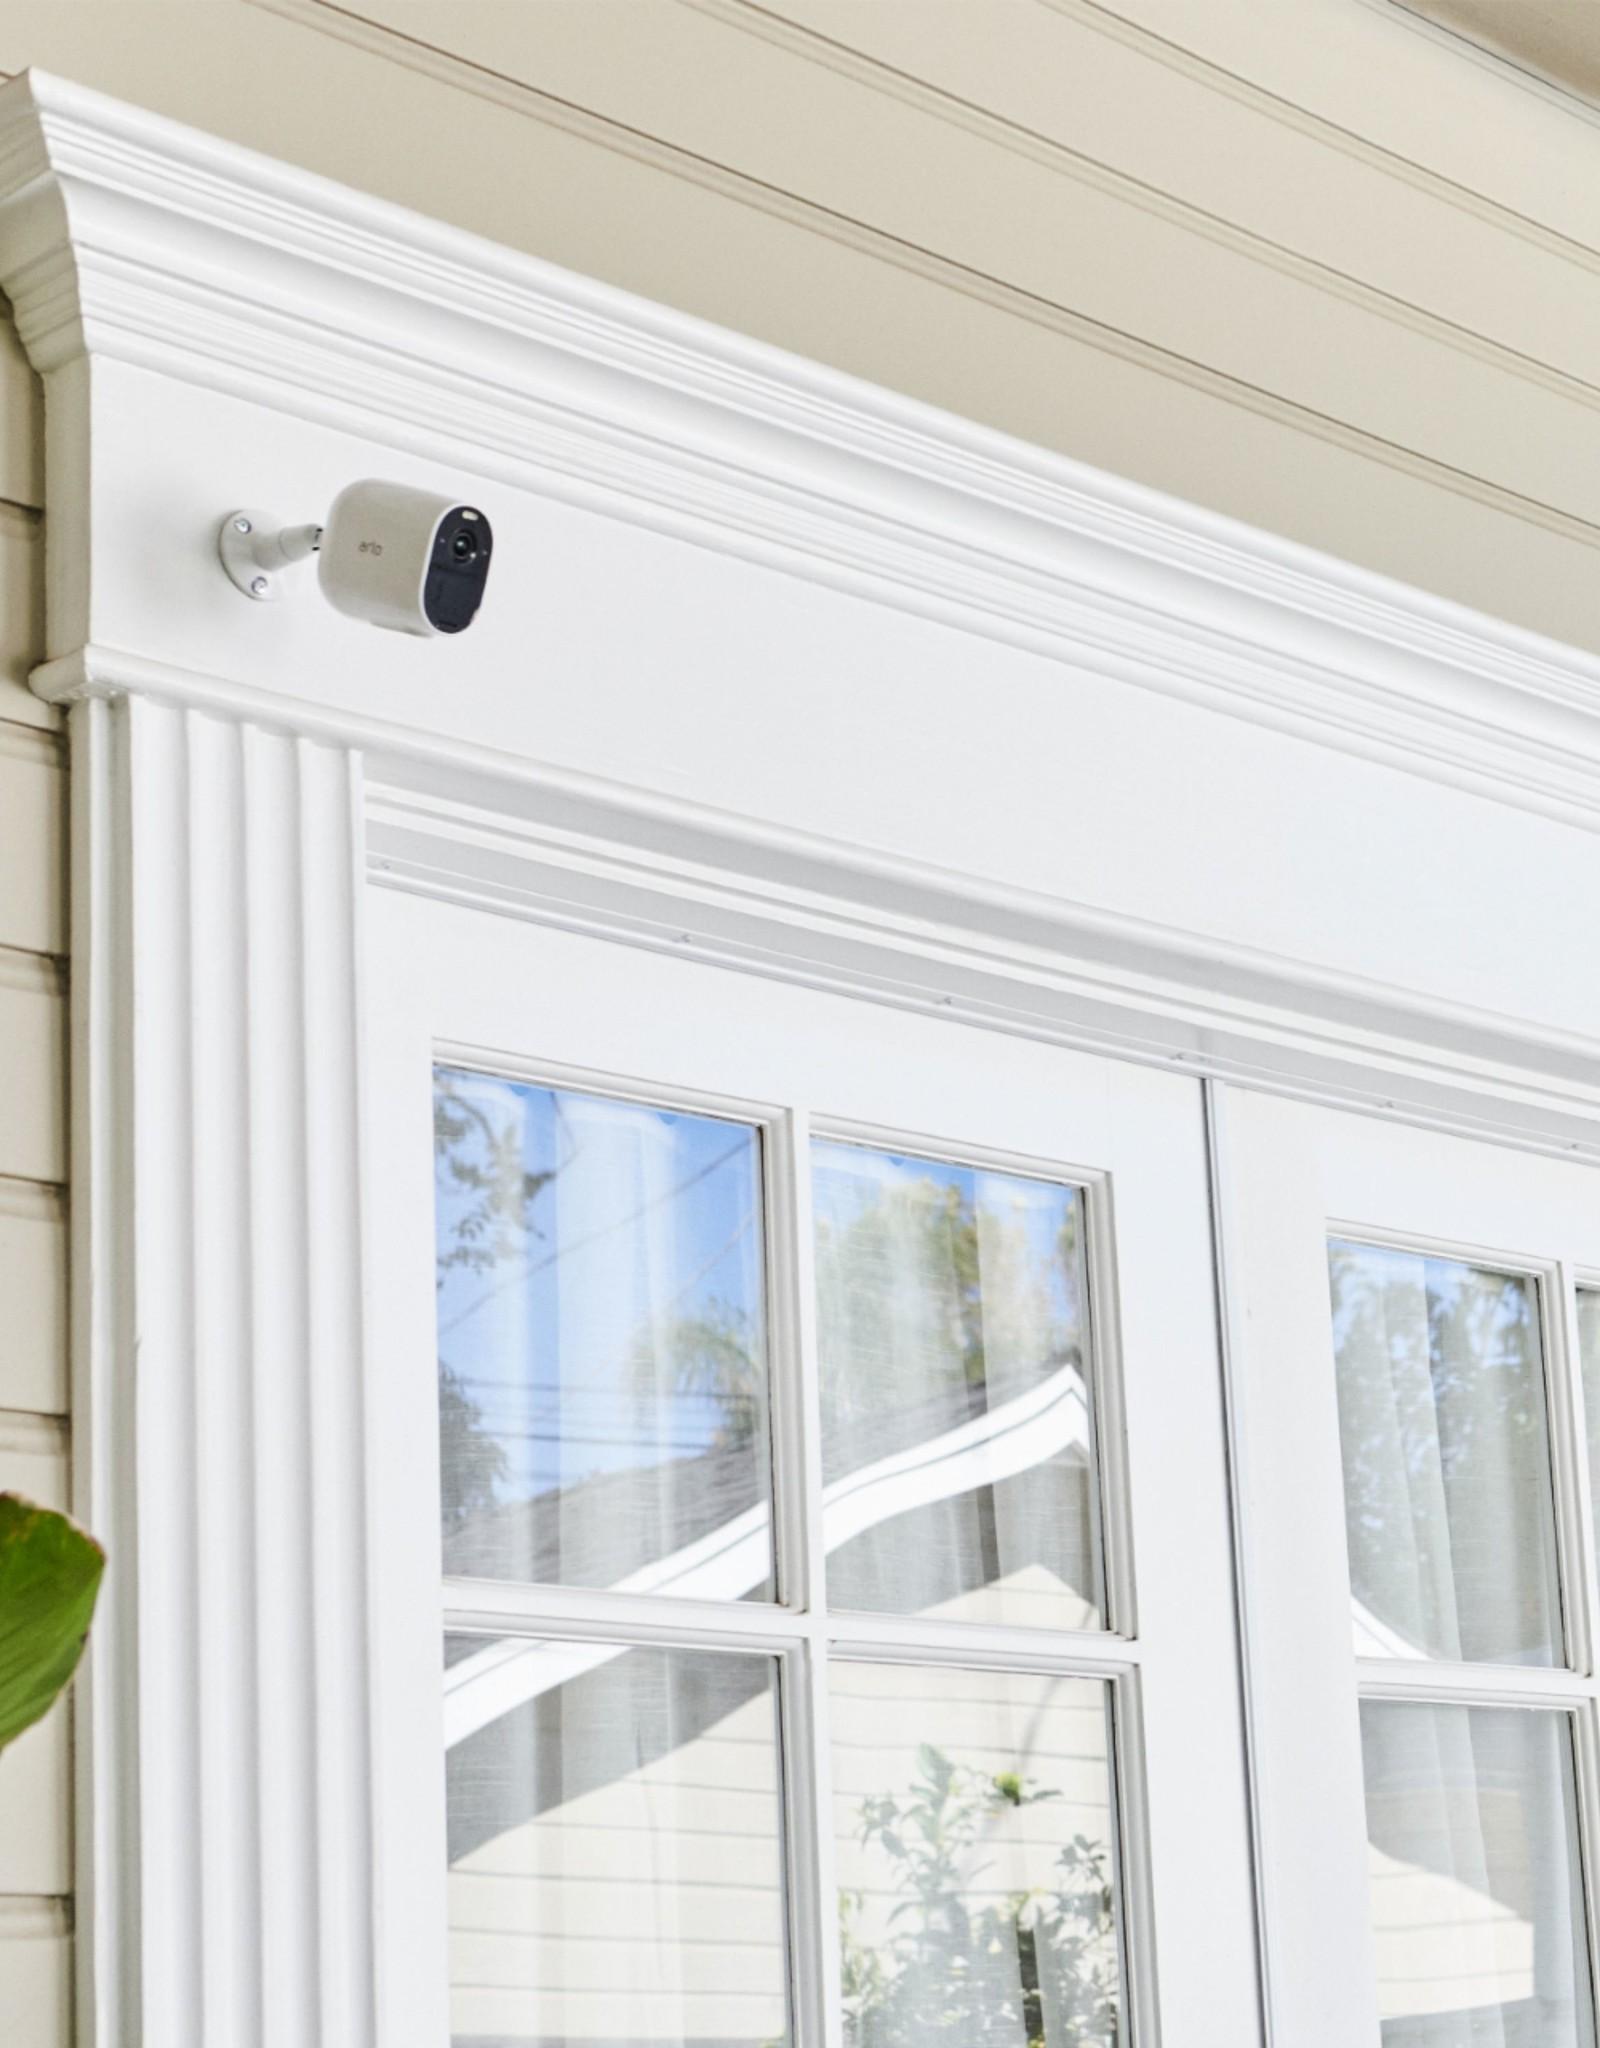 Arlo Arlo - Essential Spotlight Camera – Indoor/Outdoor Wire-Free 1080p Security Camera (3-pack) - White